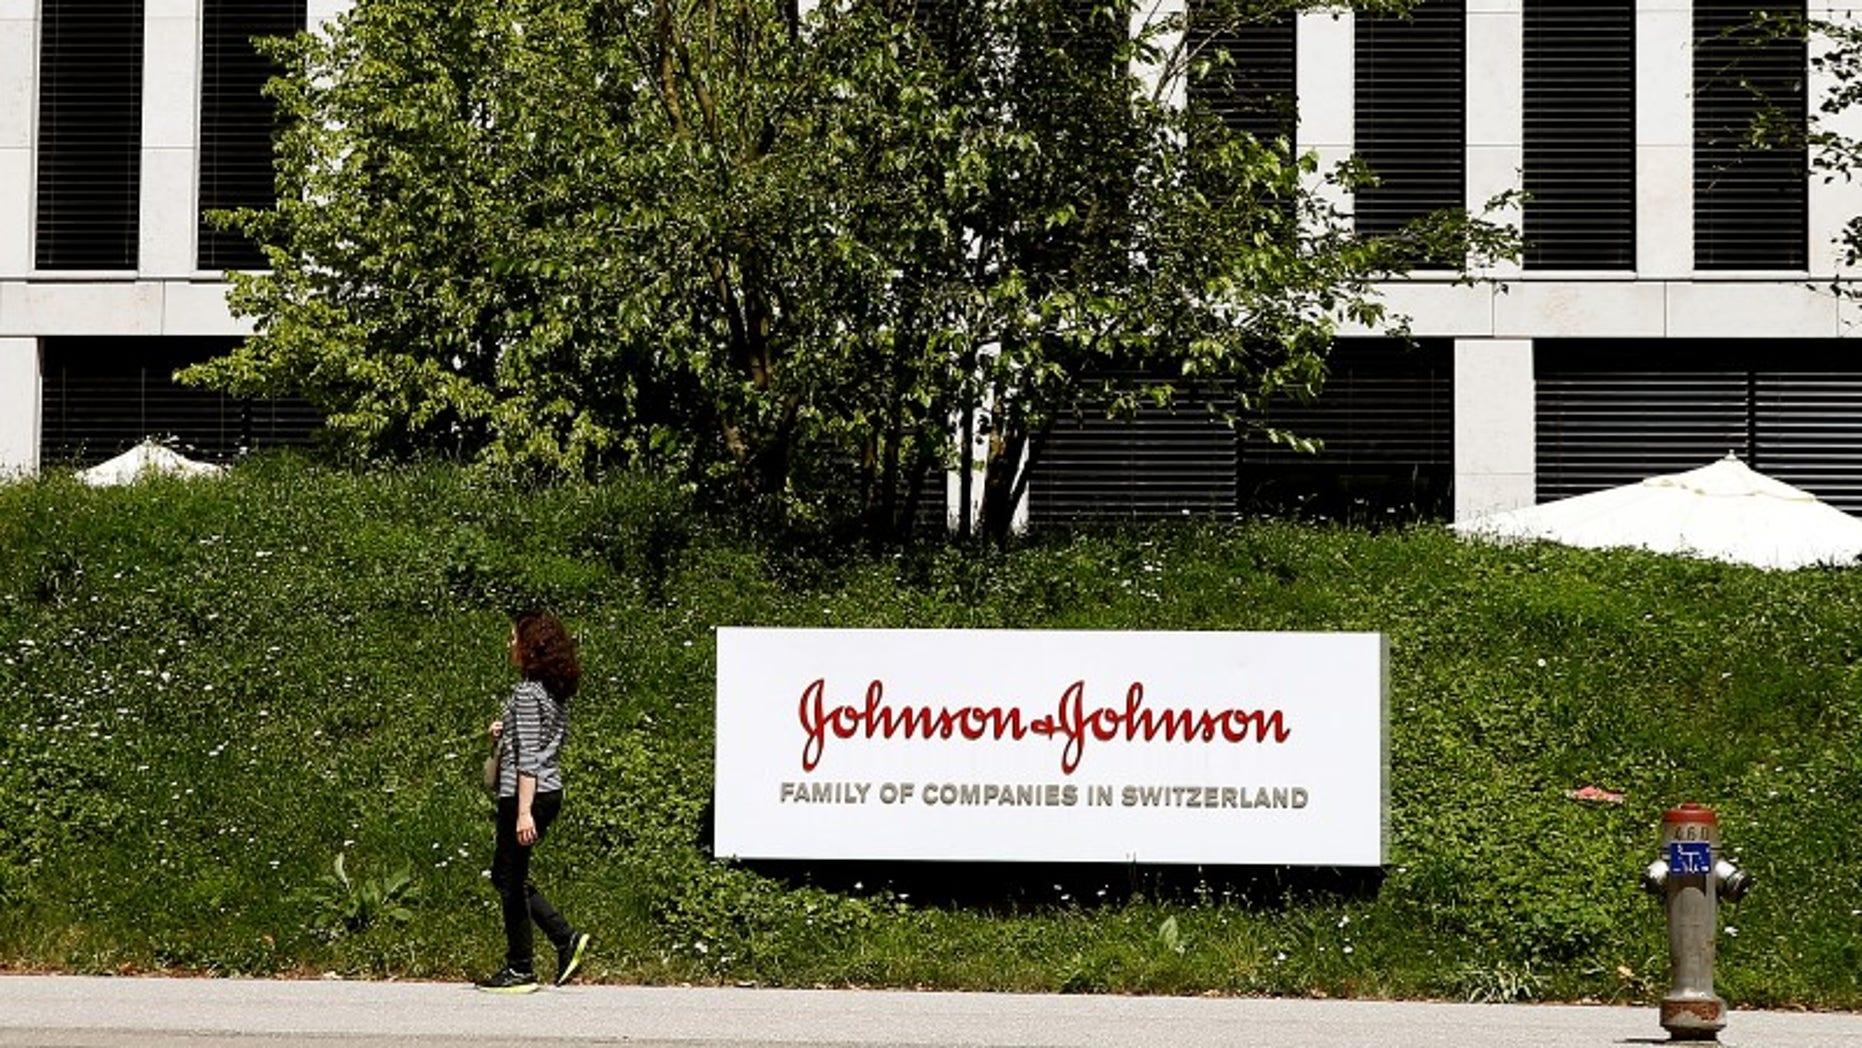 Logo of healthcare company Johnson & Johnson is seen in Zug